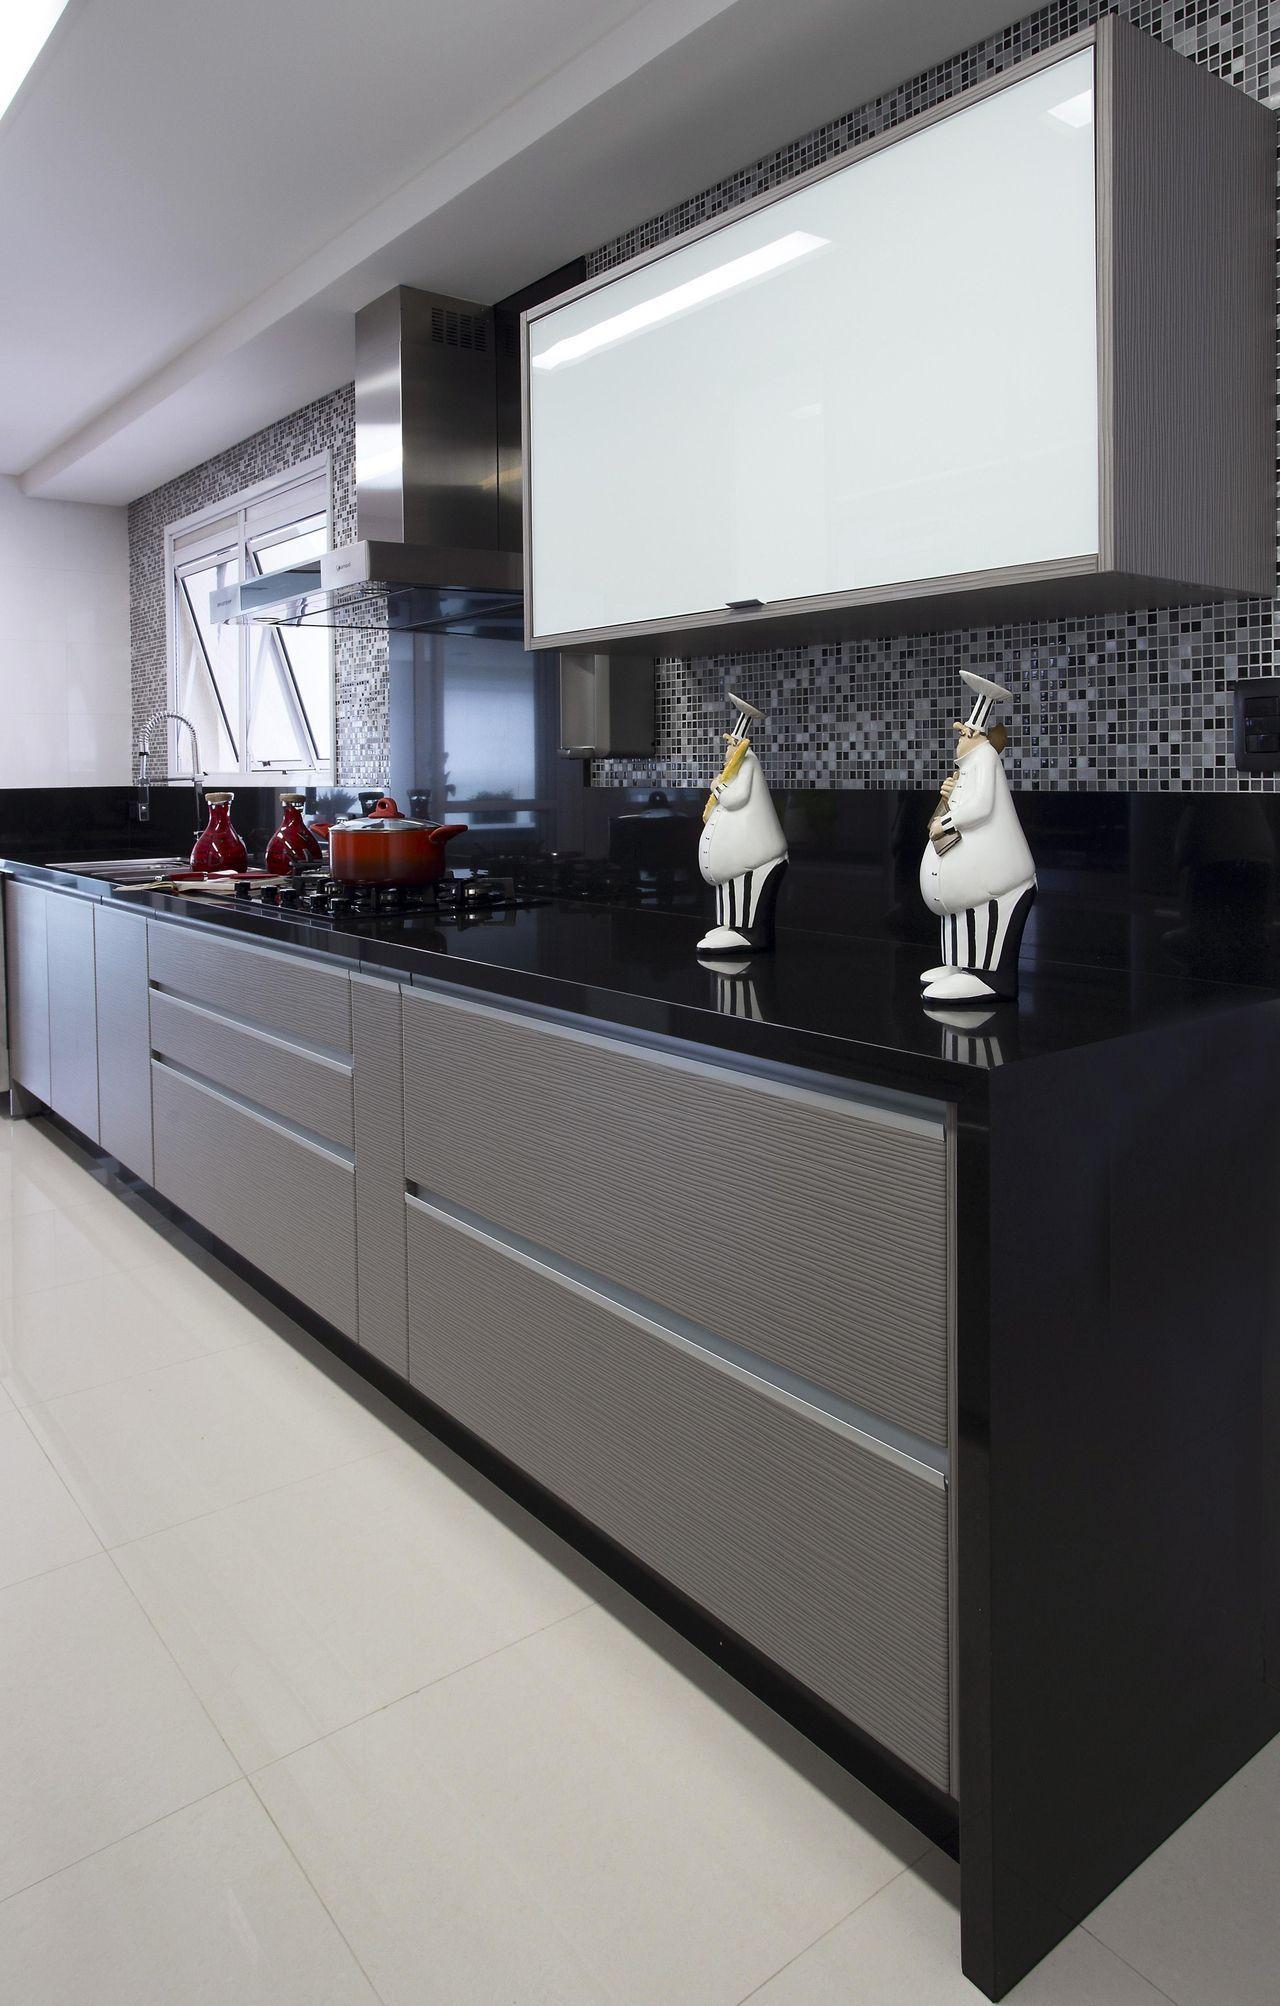 quero esssssssaaaaa projeto pinterest haus badezimmer und schrank. Black Bedroom Furniture Sets. Home Design Ideas